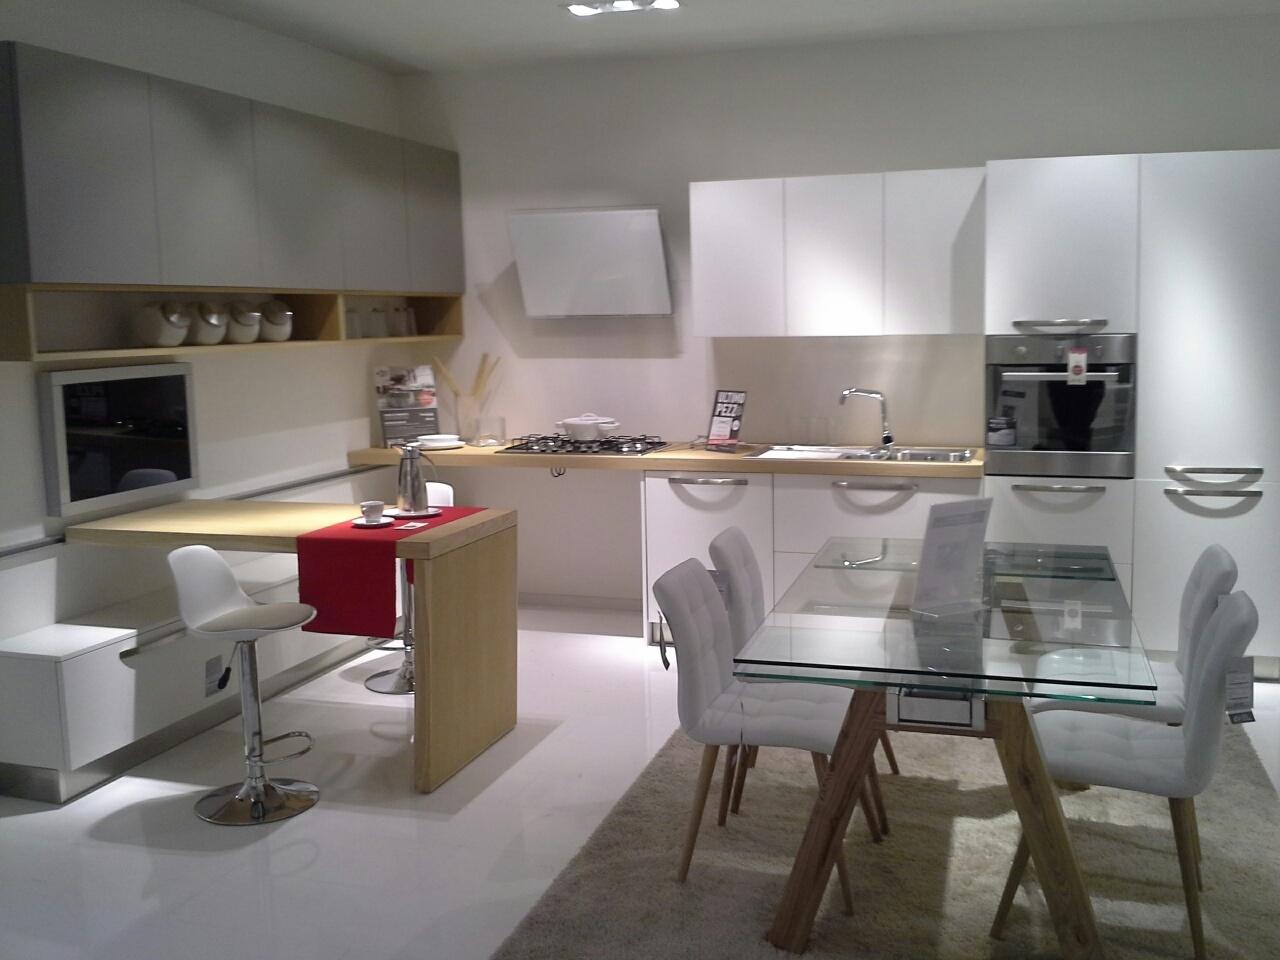 Cucine moderne con bancone ys22 regardsdefemmes for Bancone con angolo